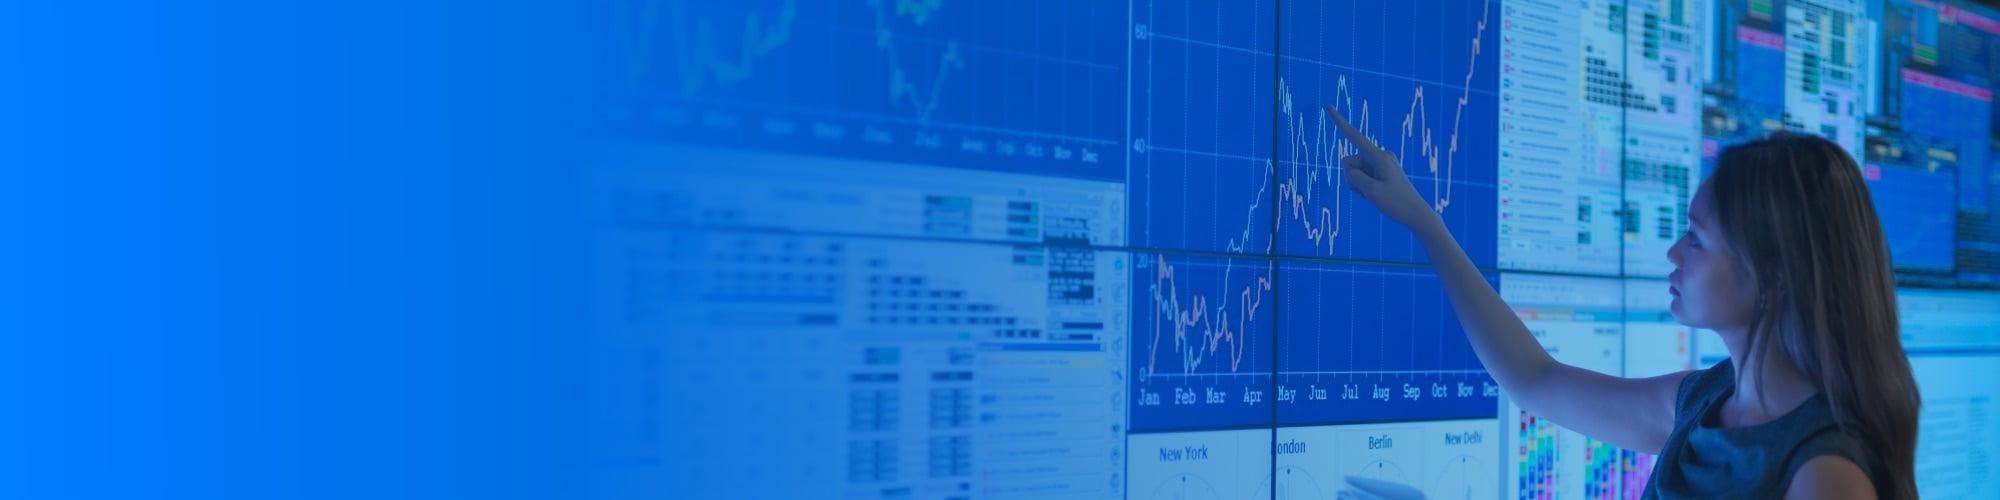 Planning Budgeting And Forecasting Ibm